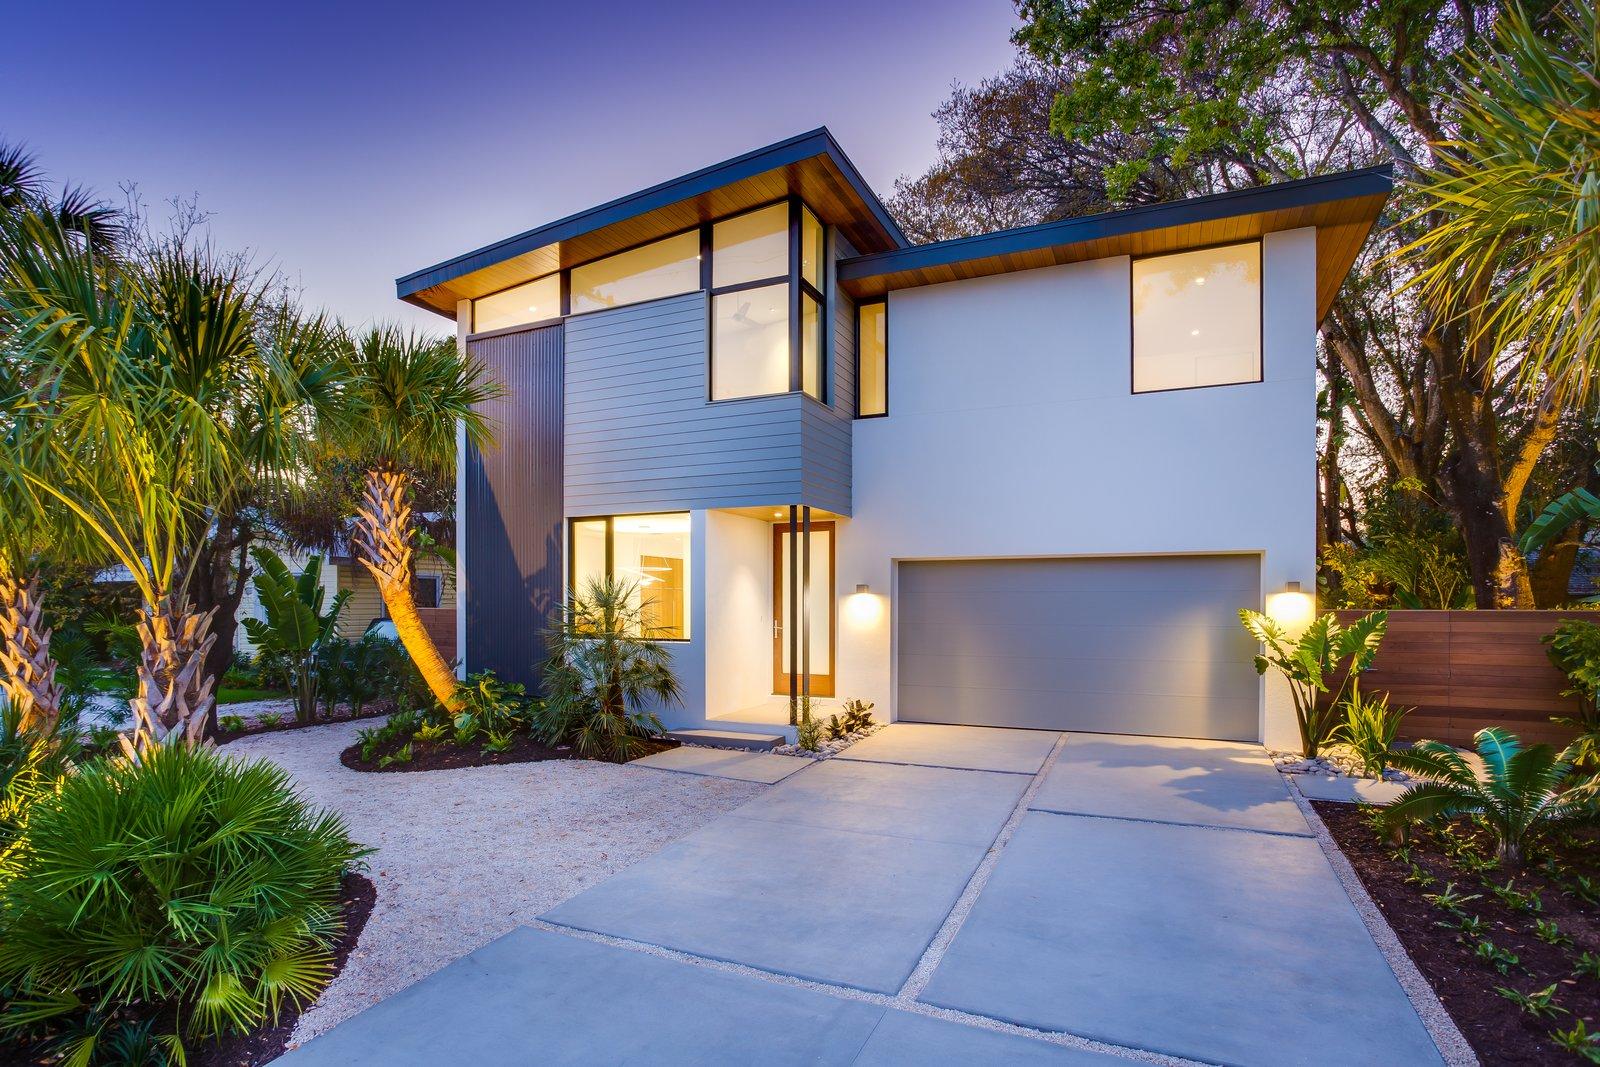 1414 South Osprey Modern Home In Sarasota Florida By